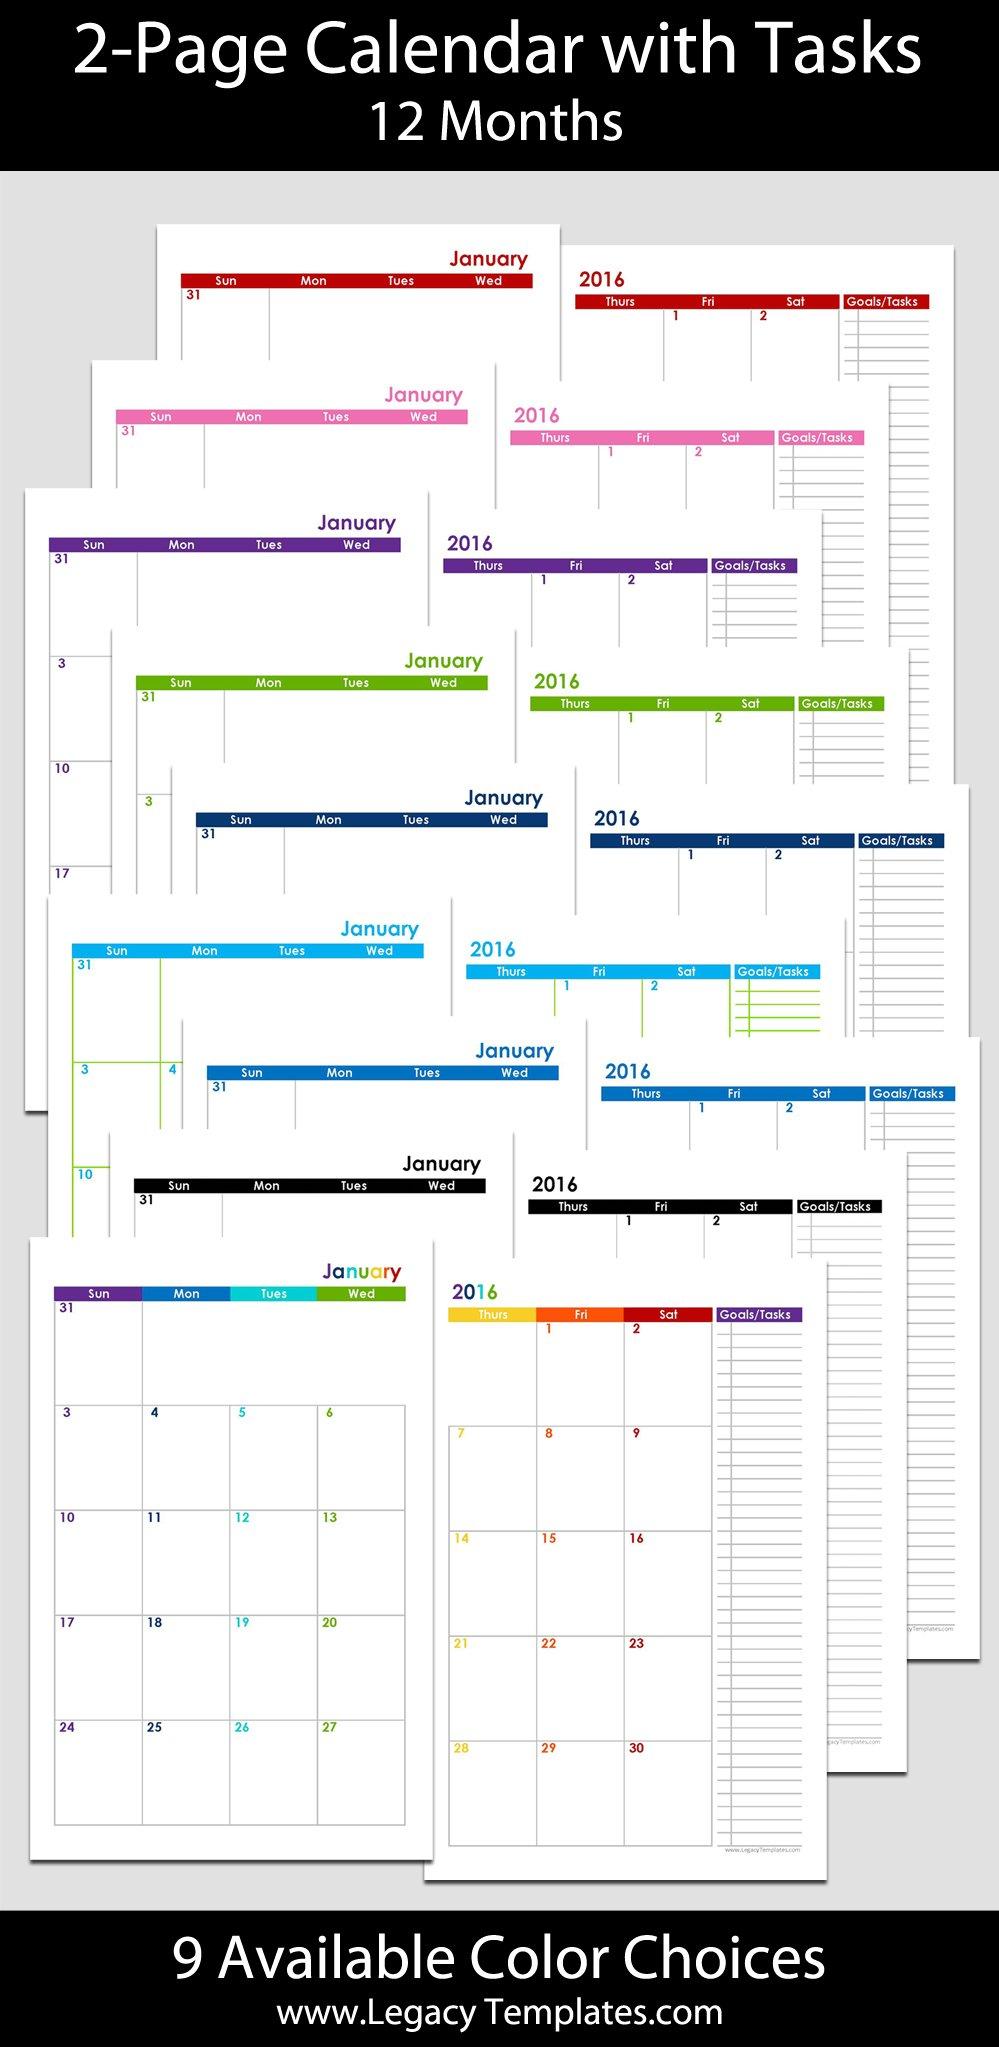 2015 12 Month 2 Page Calendar – Half Size | Legacy Templates 8 X 11 Calendar Pages